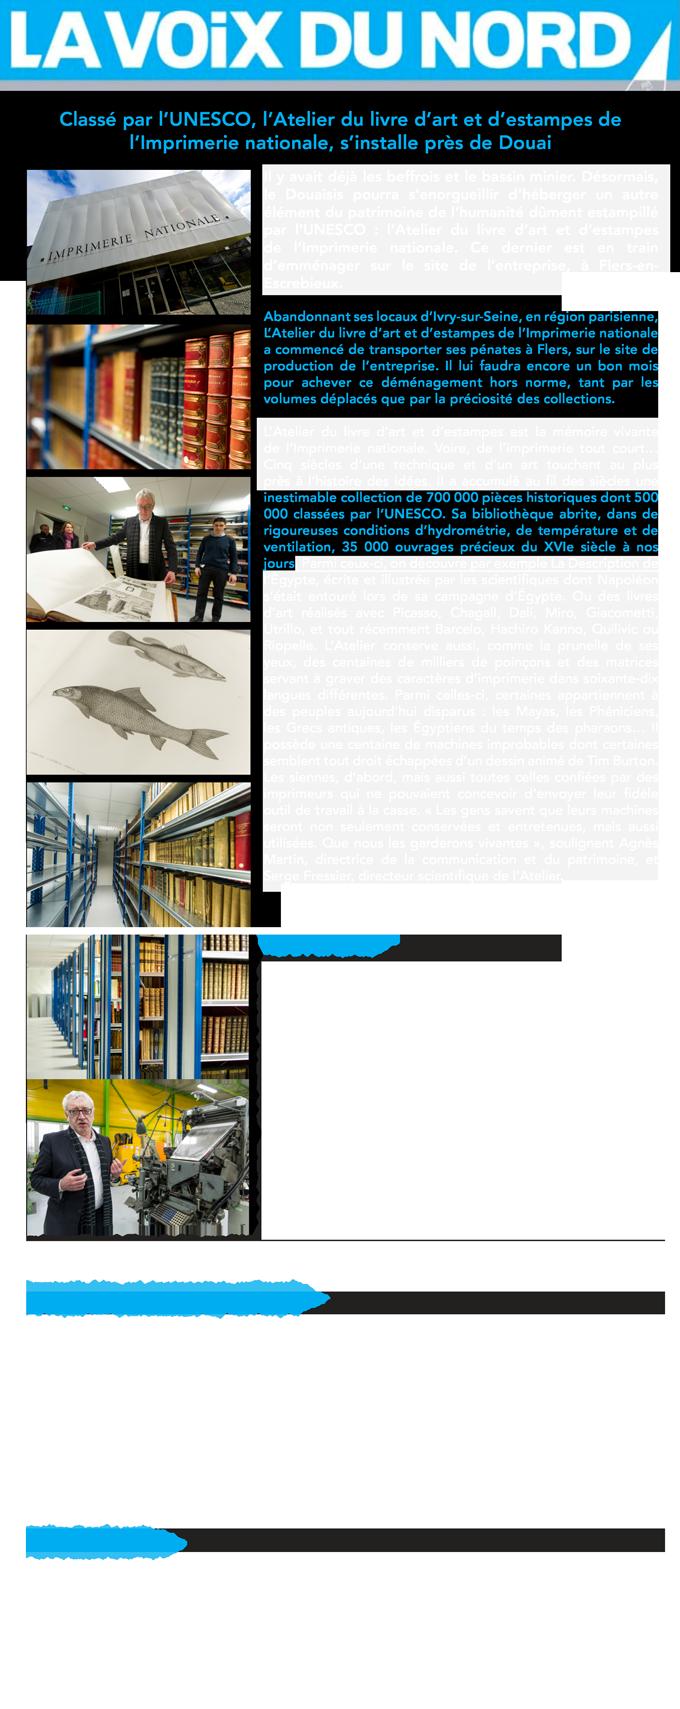 transfert de l'atelier du livre d'art